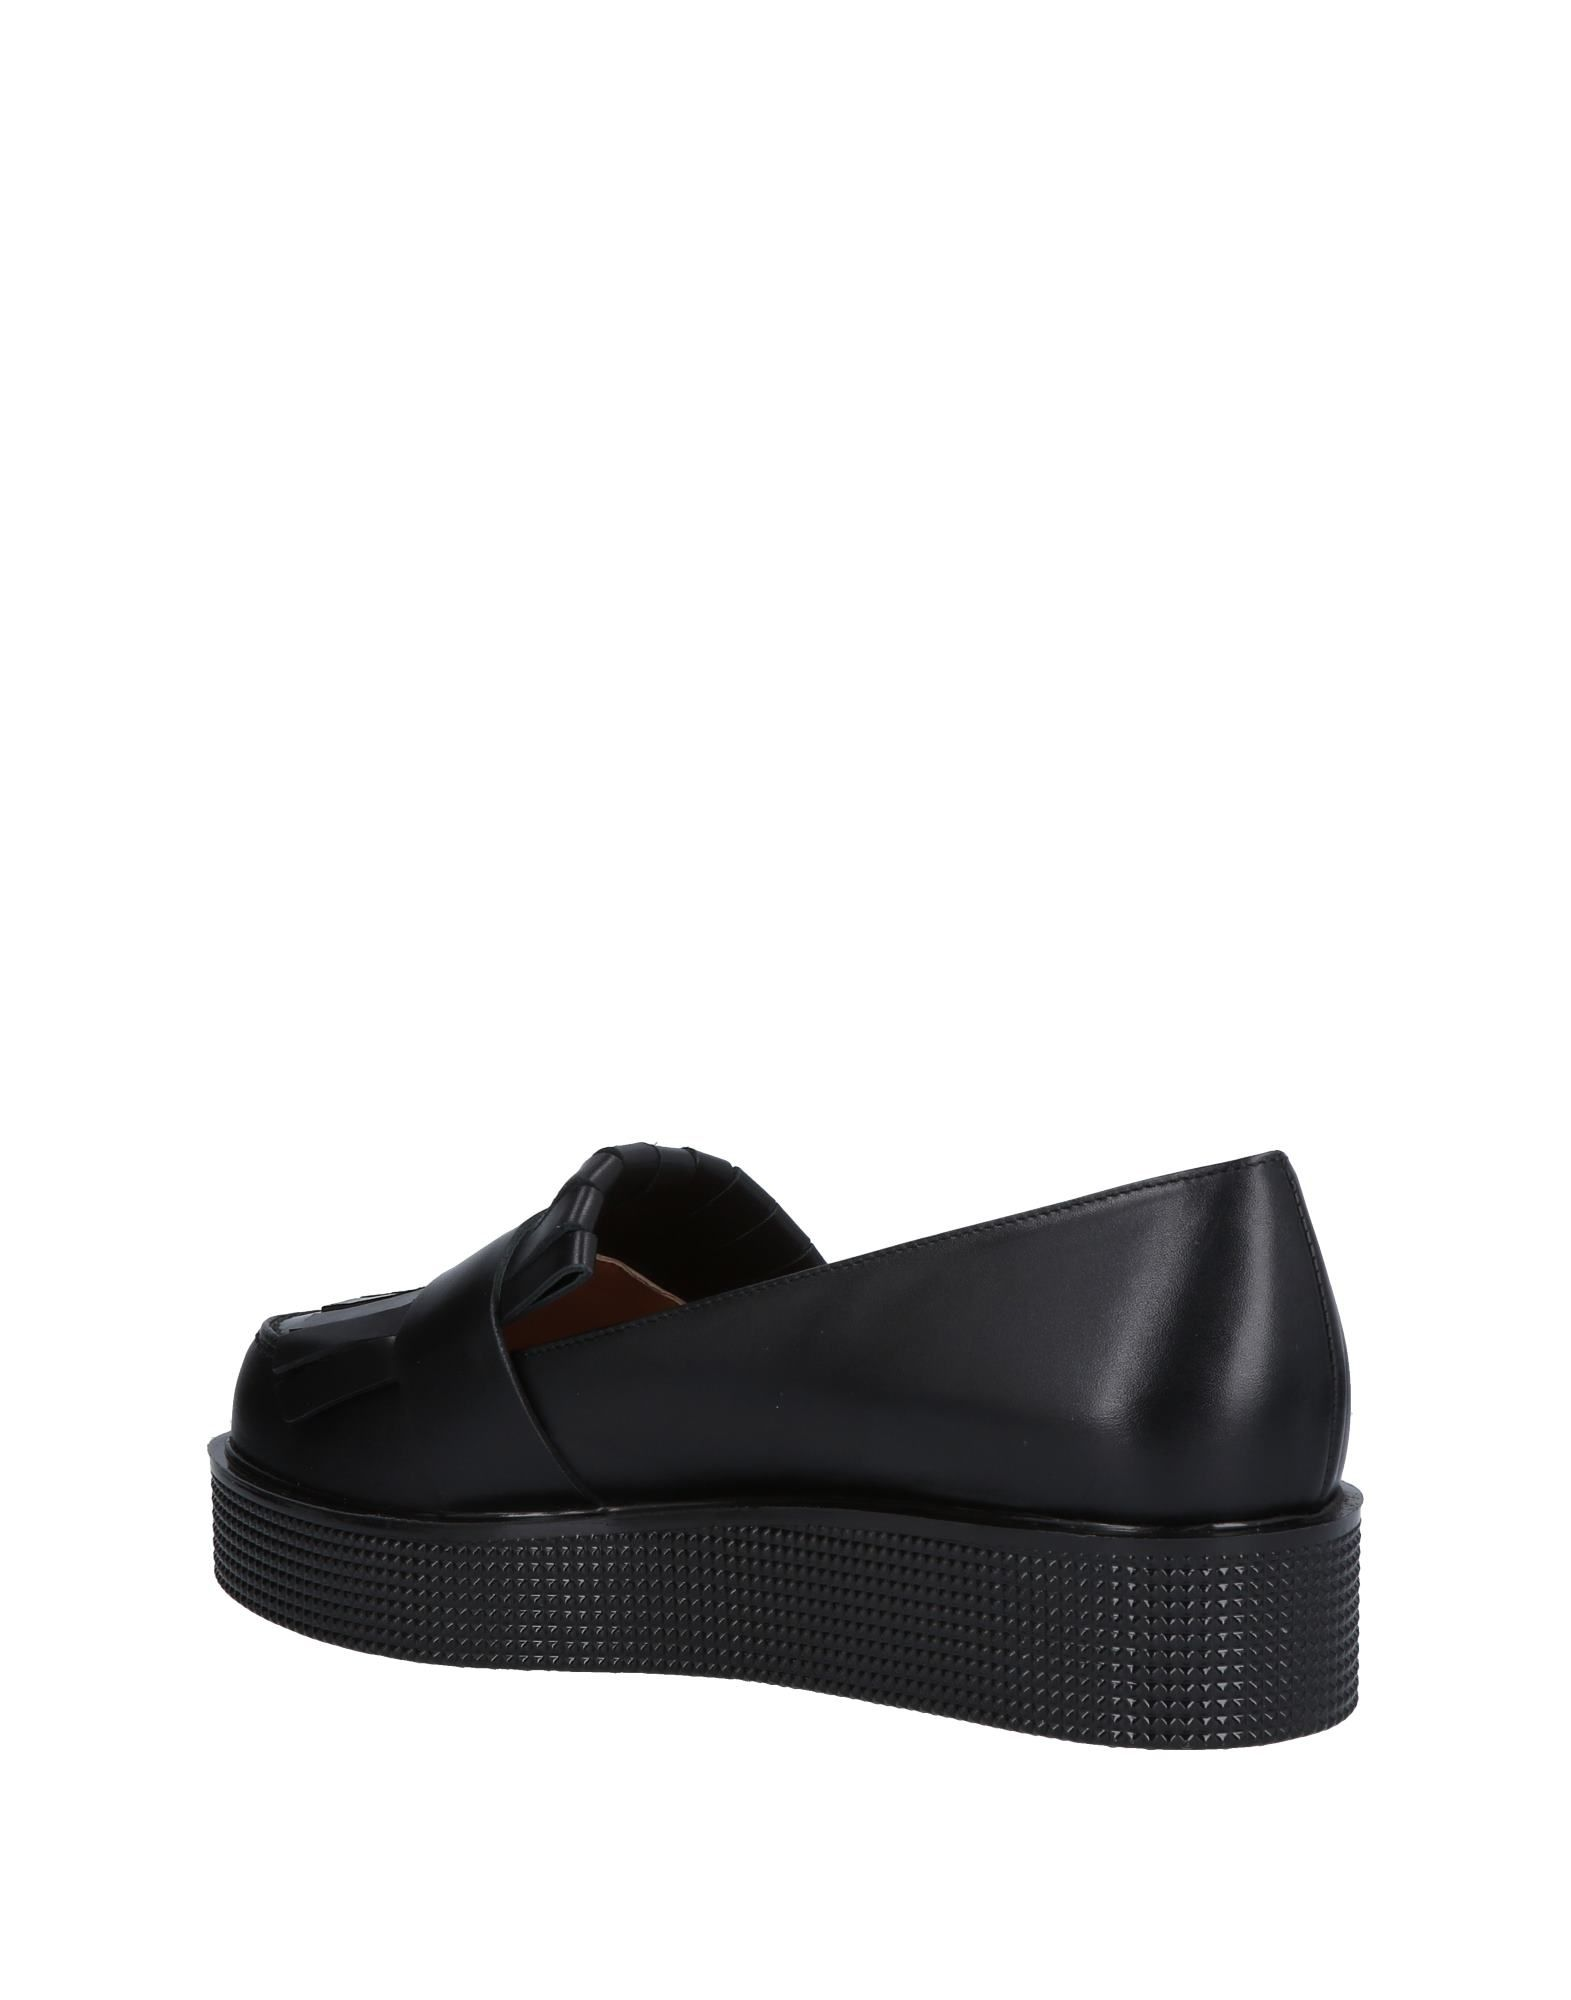 L' Autre  Chose Mokassins Damen  Autre 11487957AN Neue Schuhe 76027f